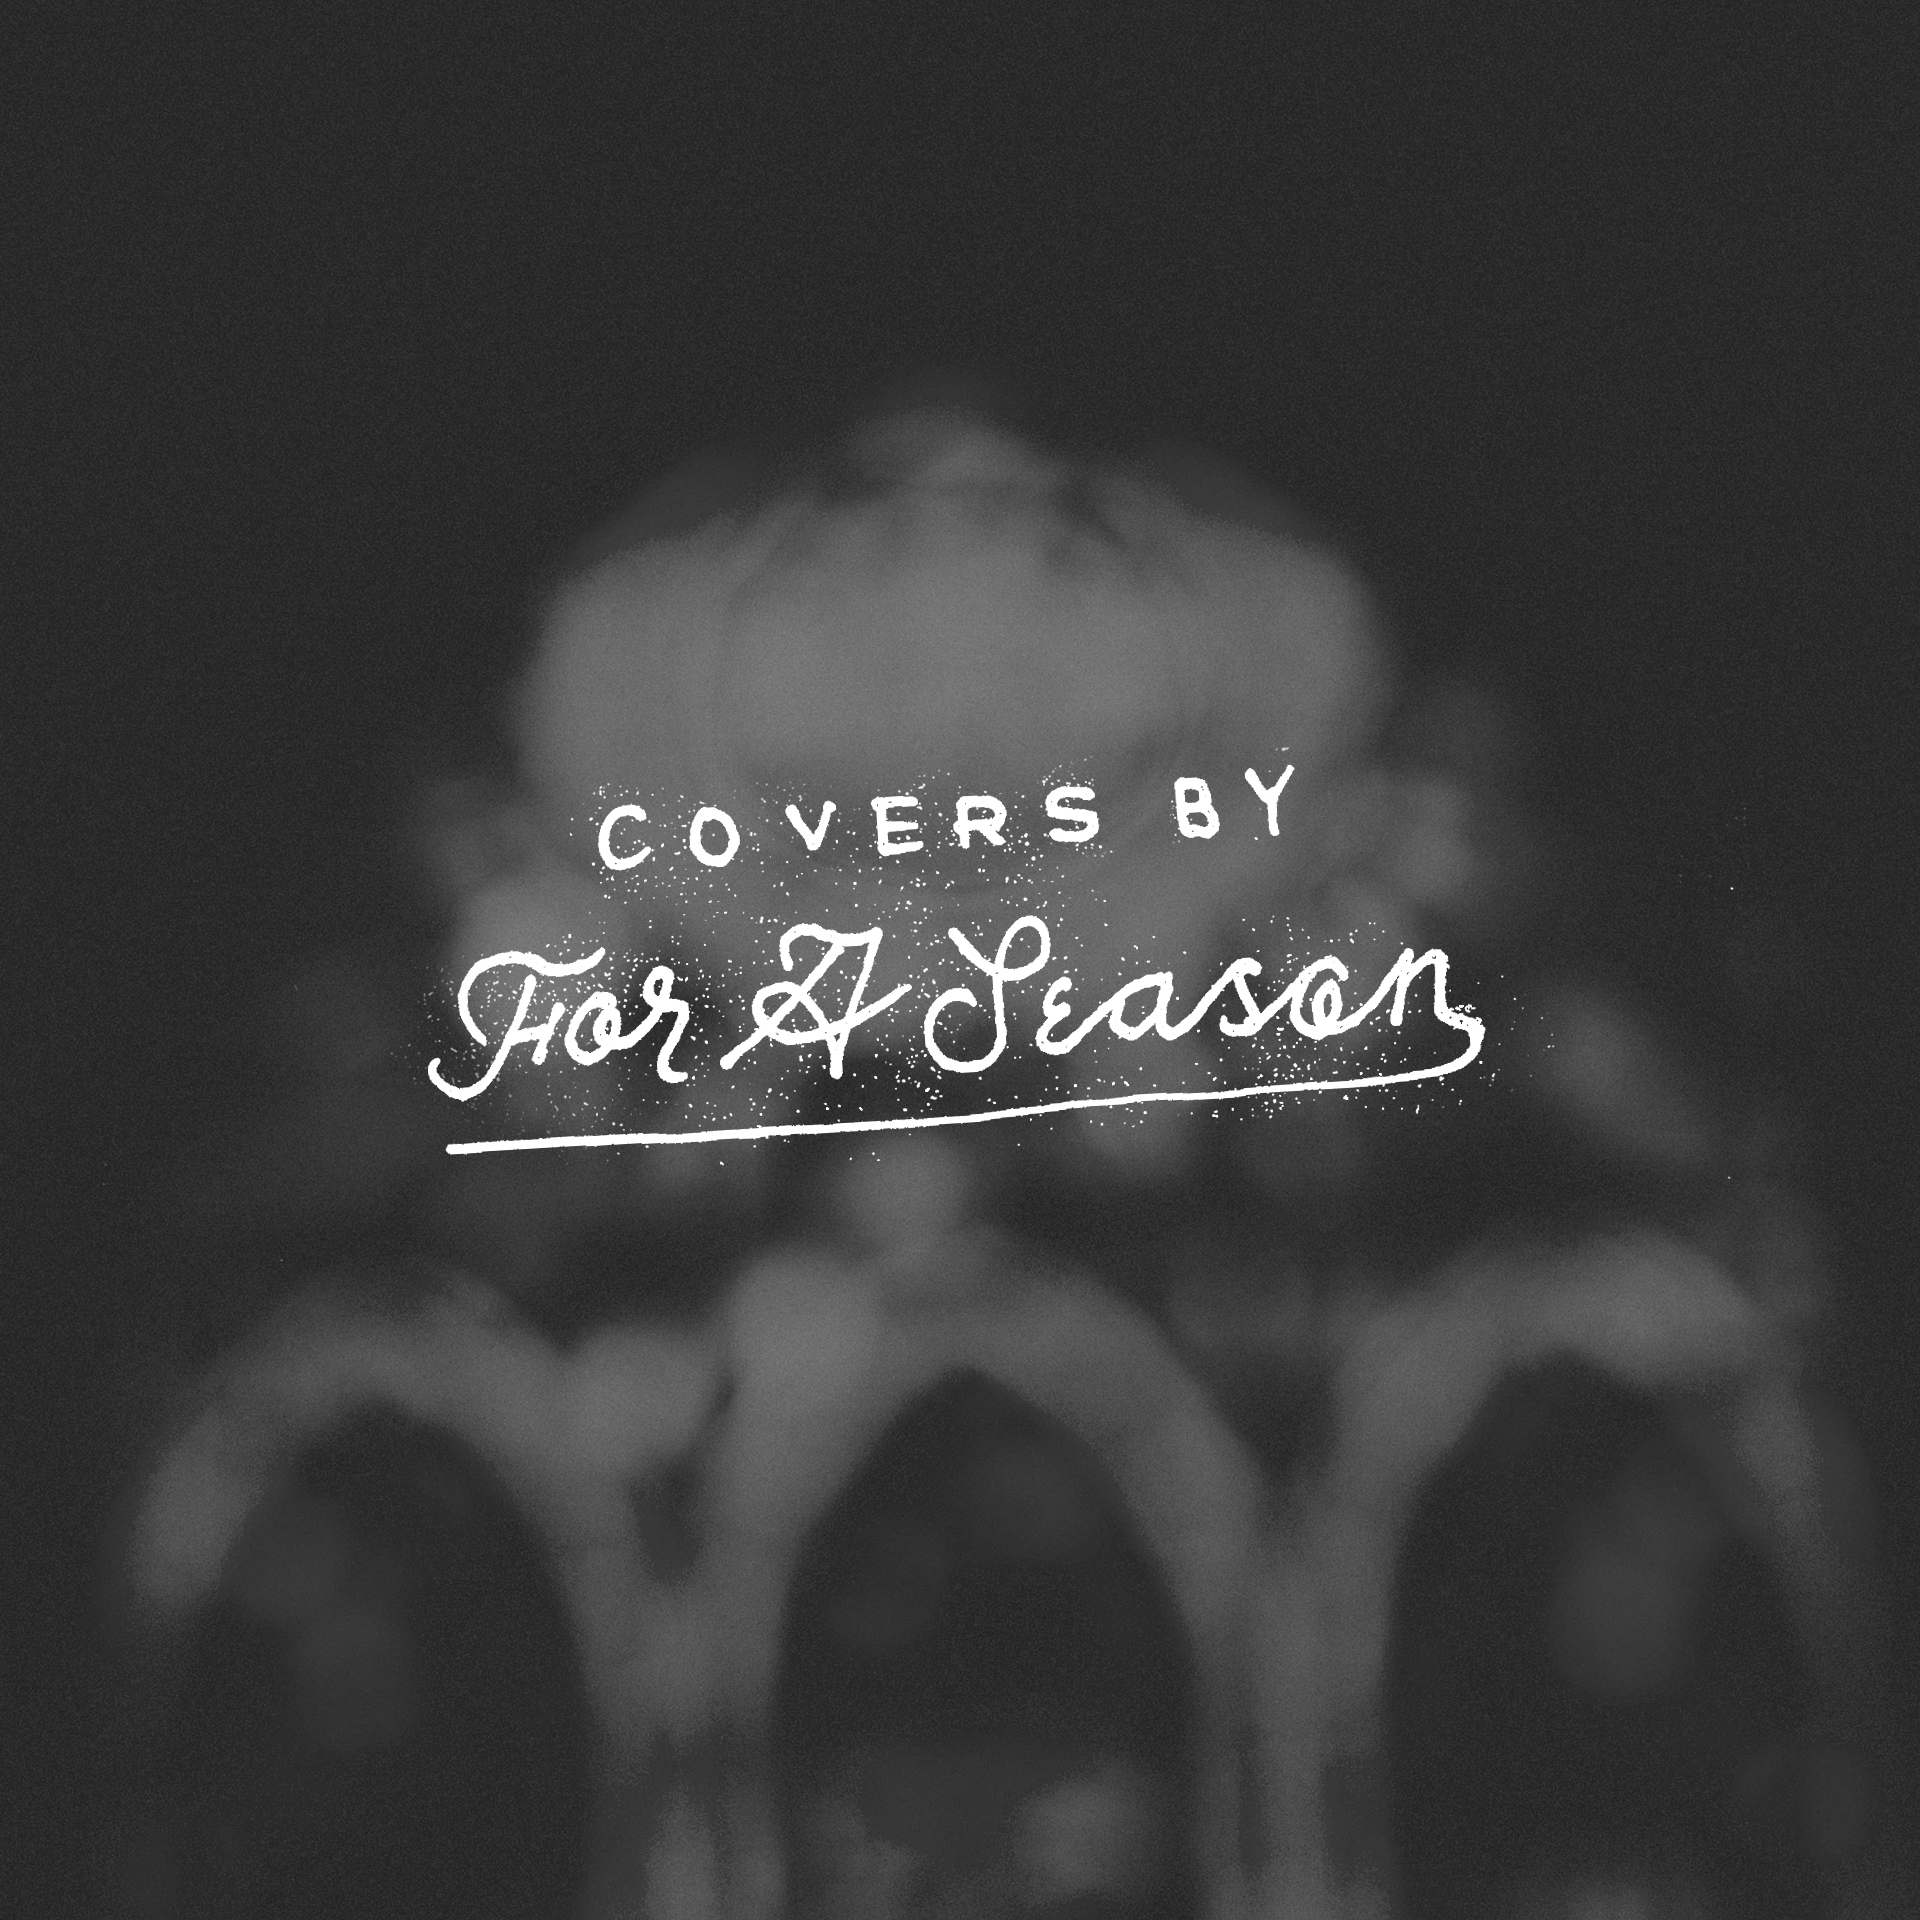 Covers_ART.jpg